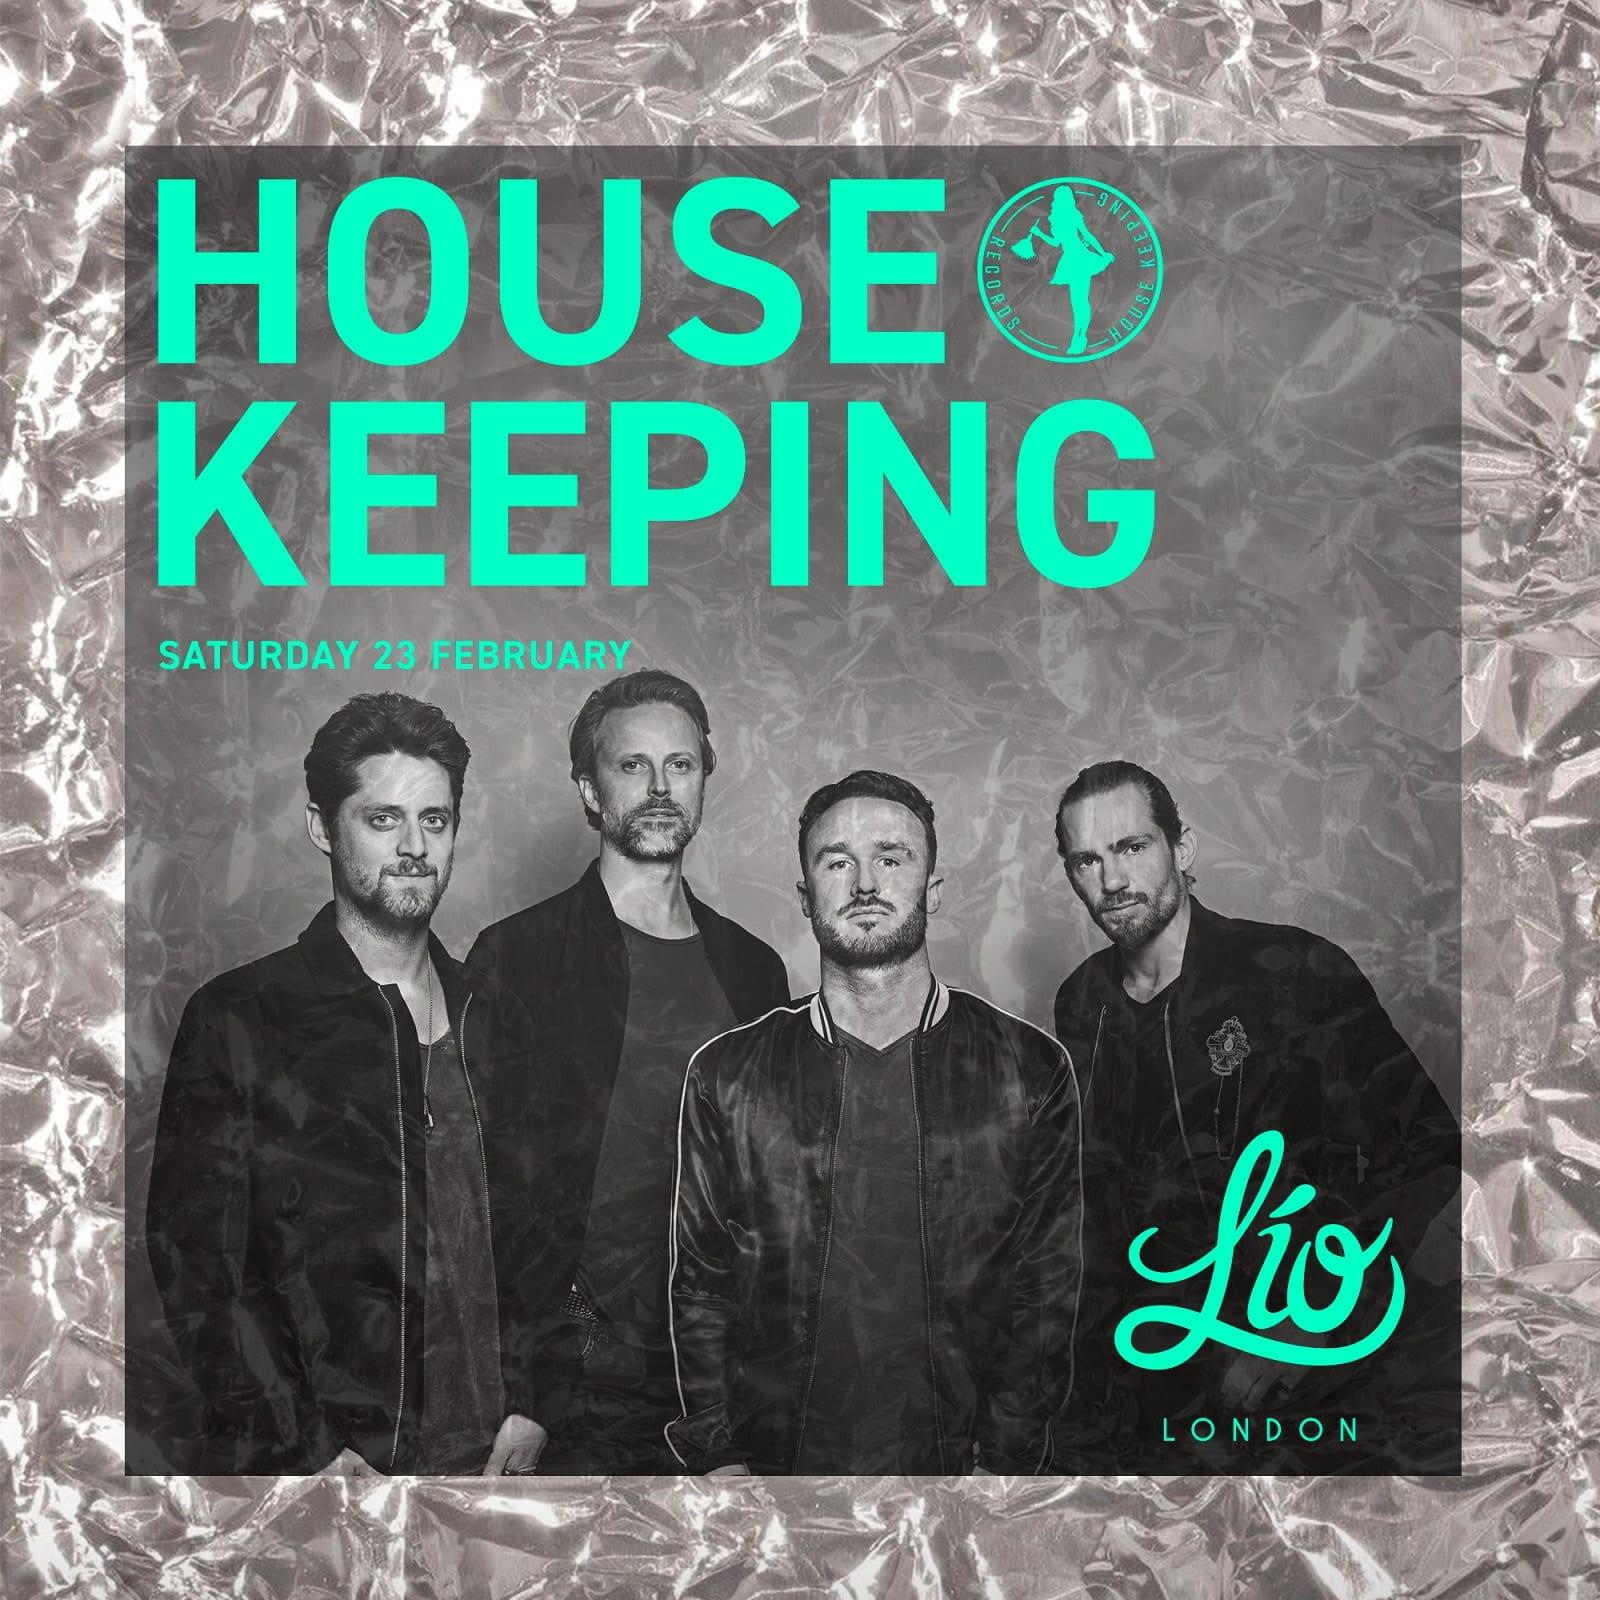 68748_0510-11e9-ad3a-005056a6209a_lio-london-house-keeeping-insta_-_copia.jpg